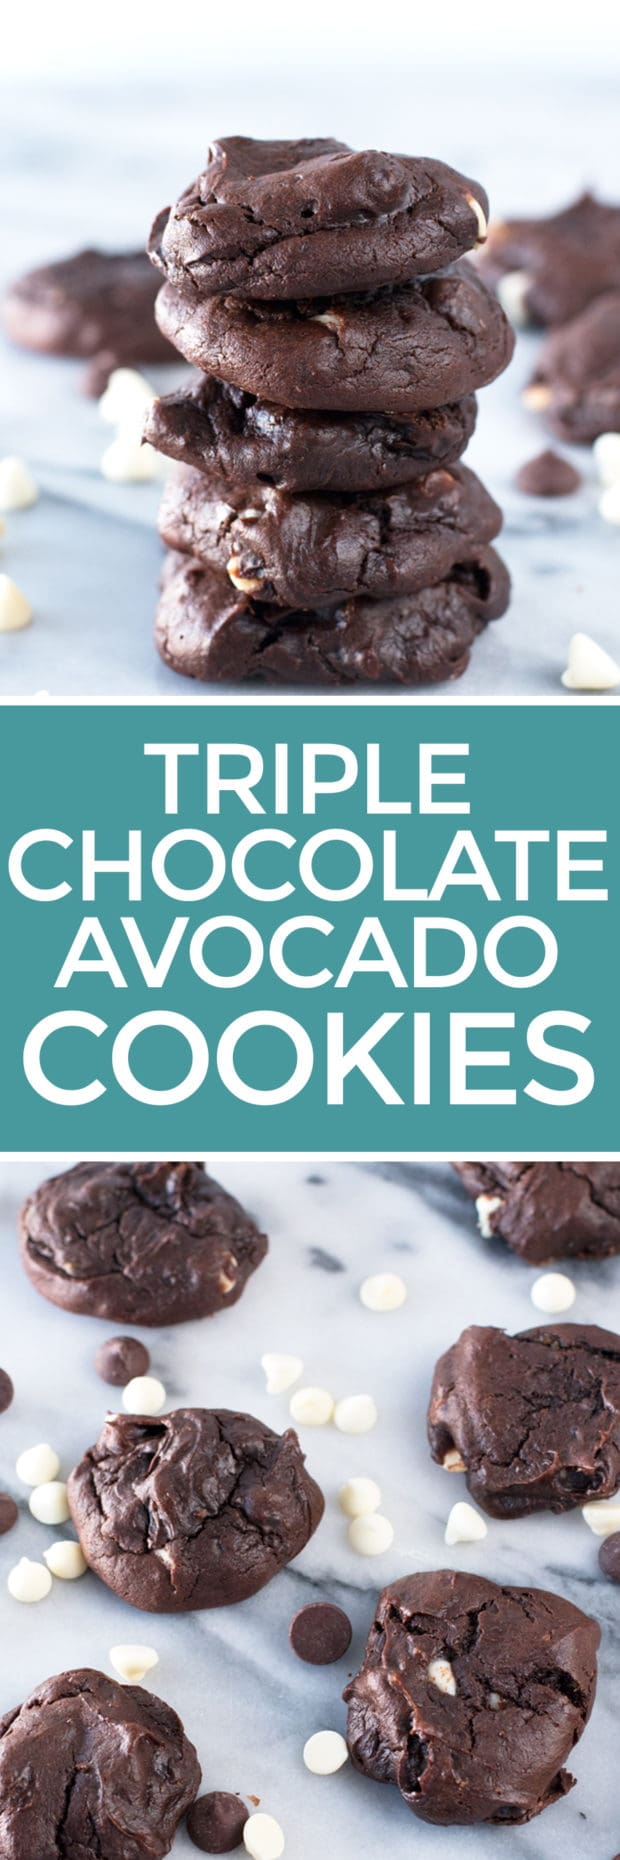 Triple Chocolate Avocado Cookies   cakenknife.com